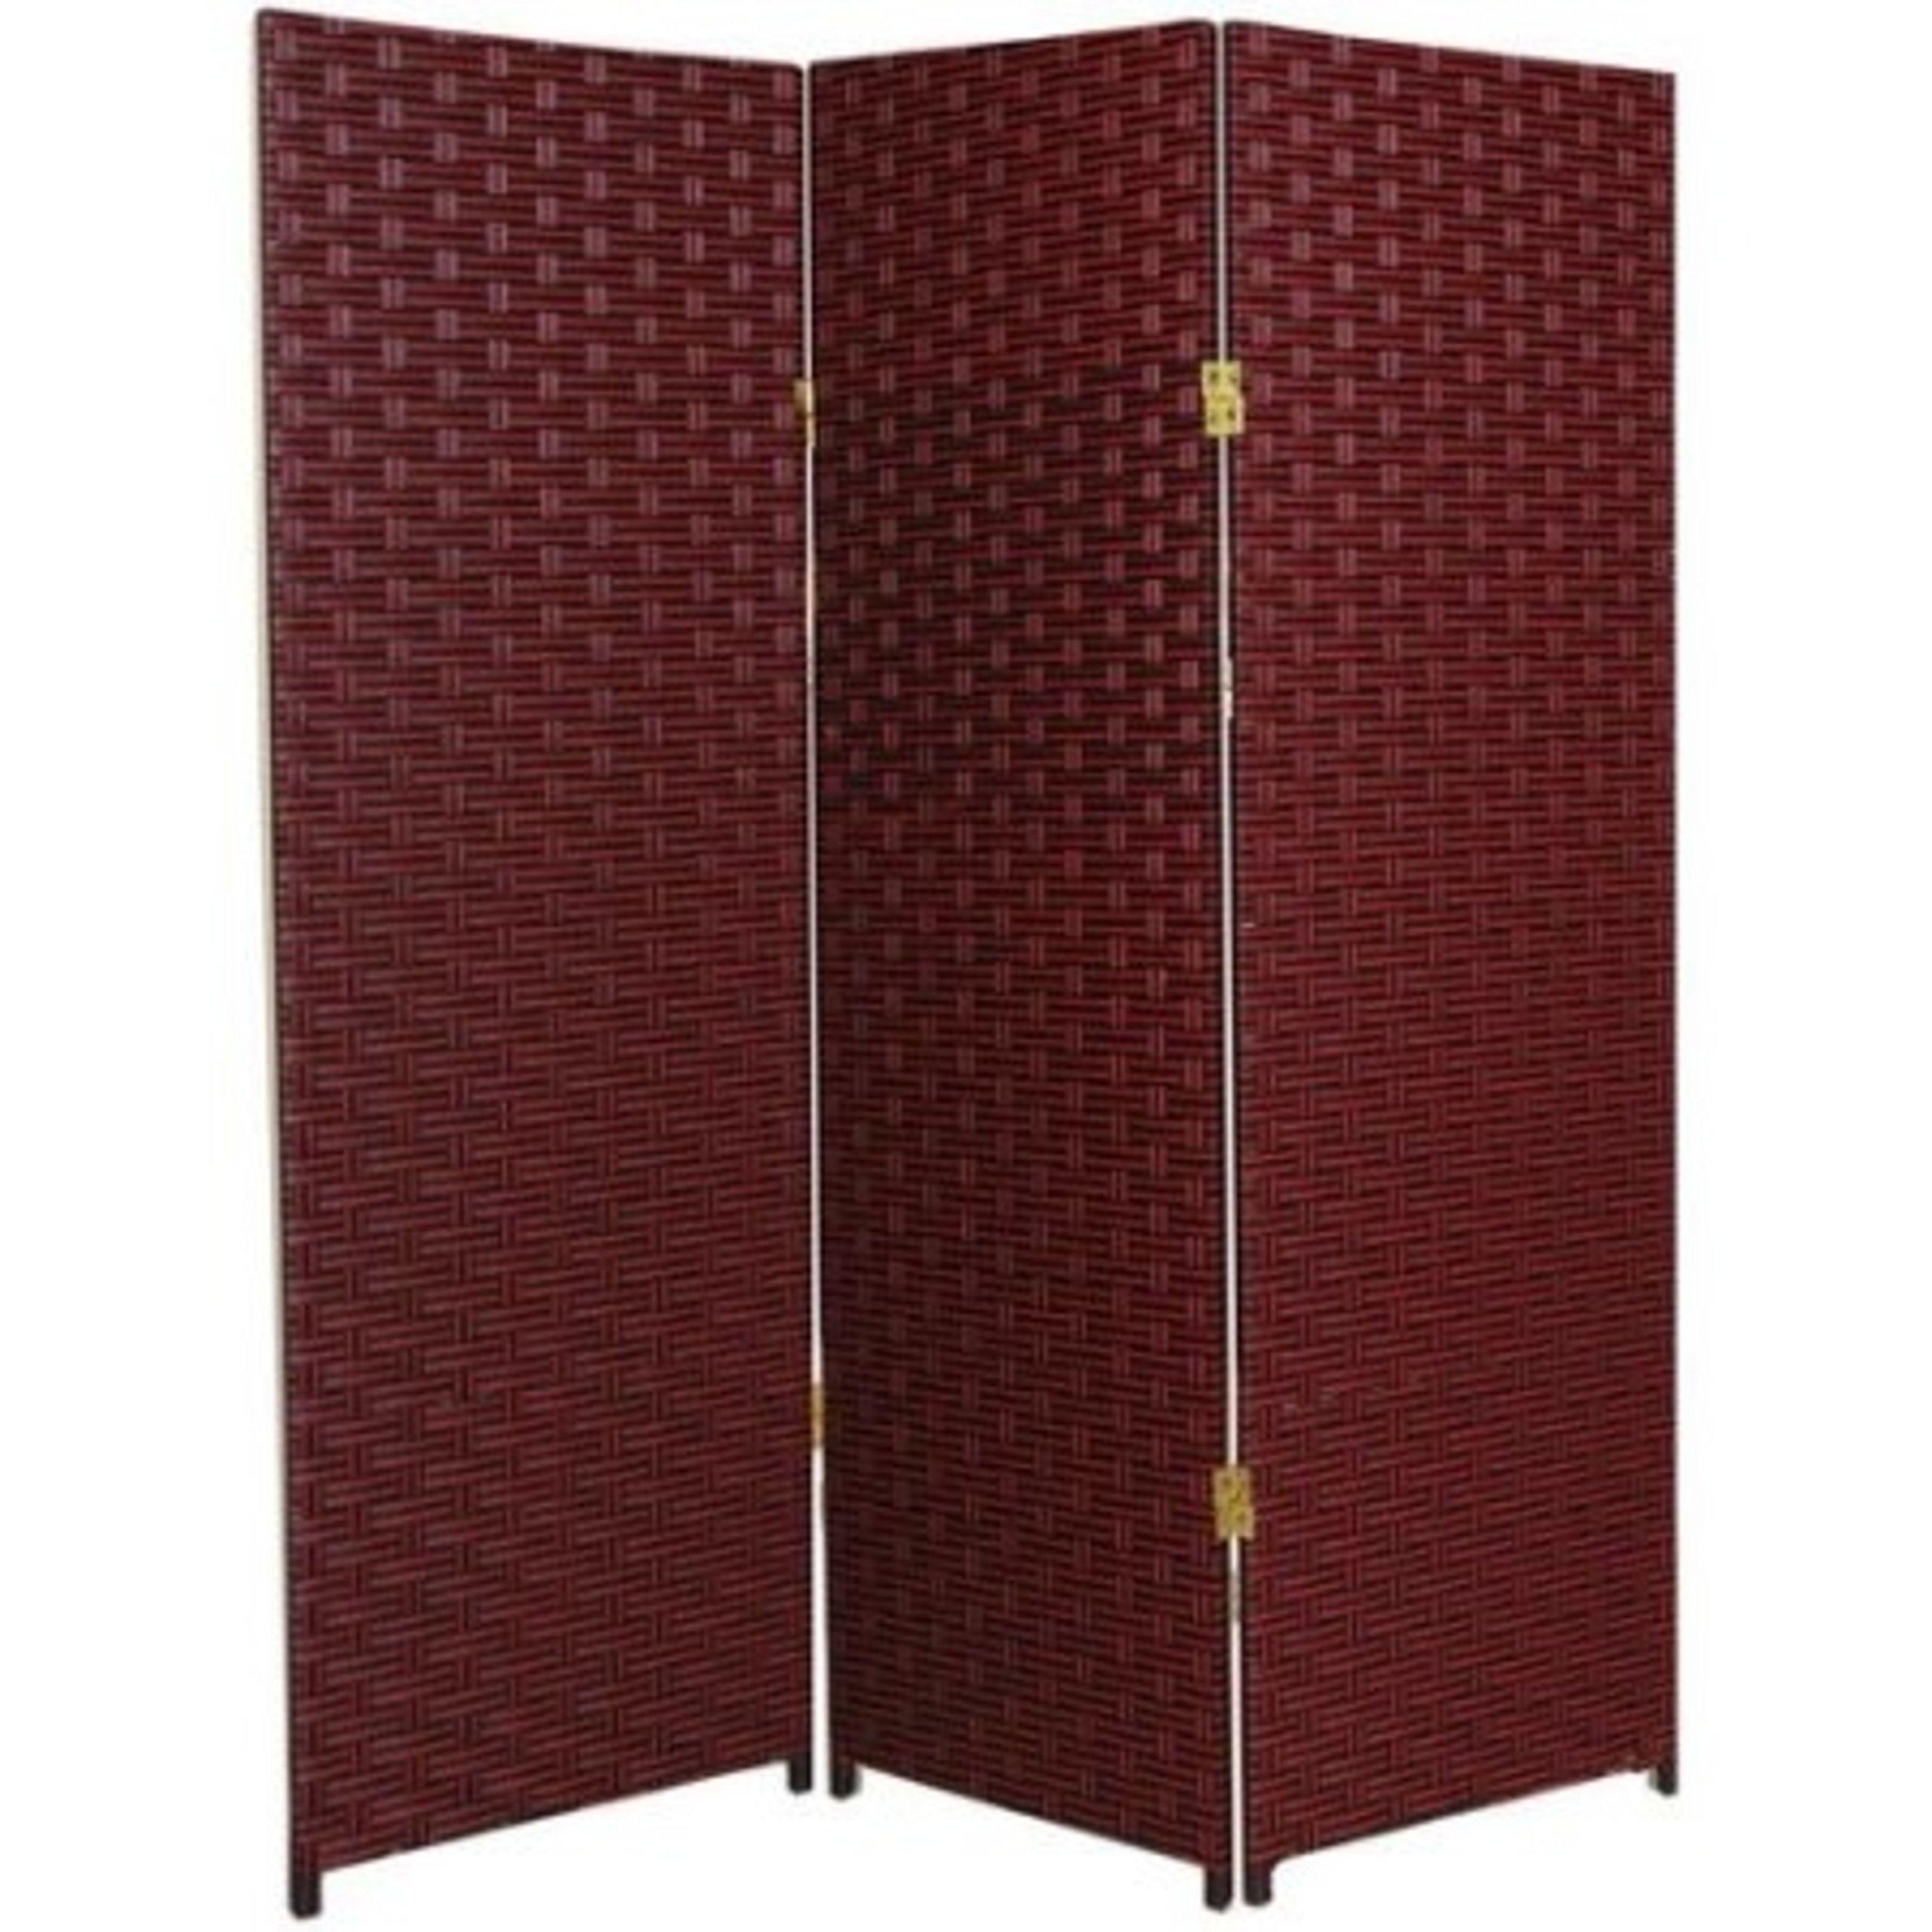 Natural Plant Fiber Woven Room Decor Red 3 Panels Divider by Oriental Furniture Panels Divider (Image #1)